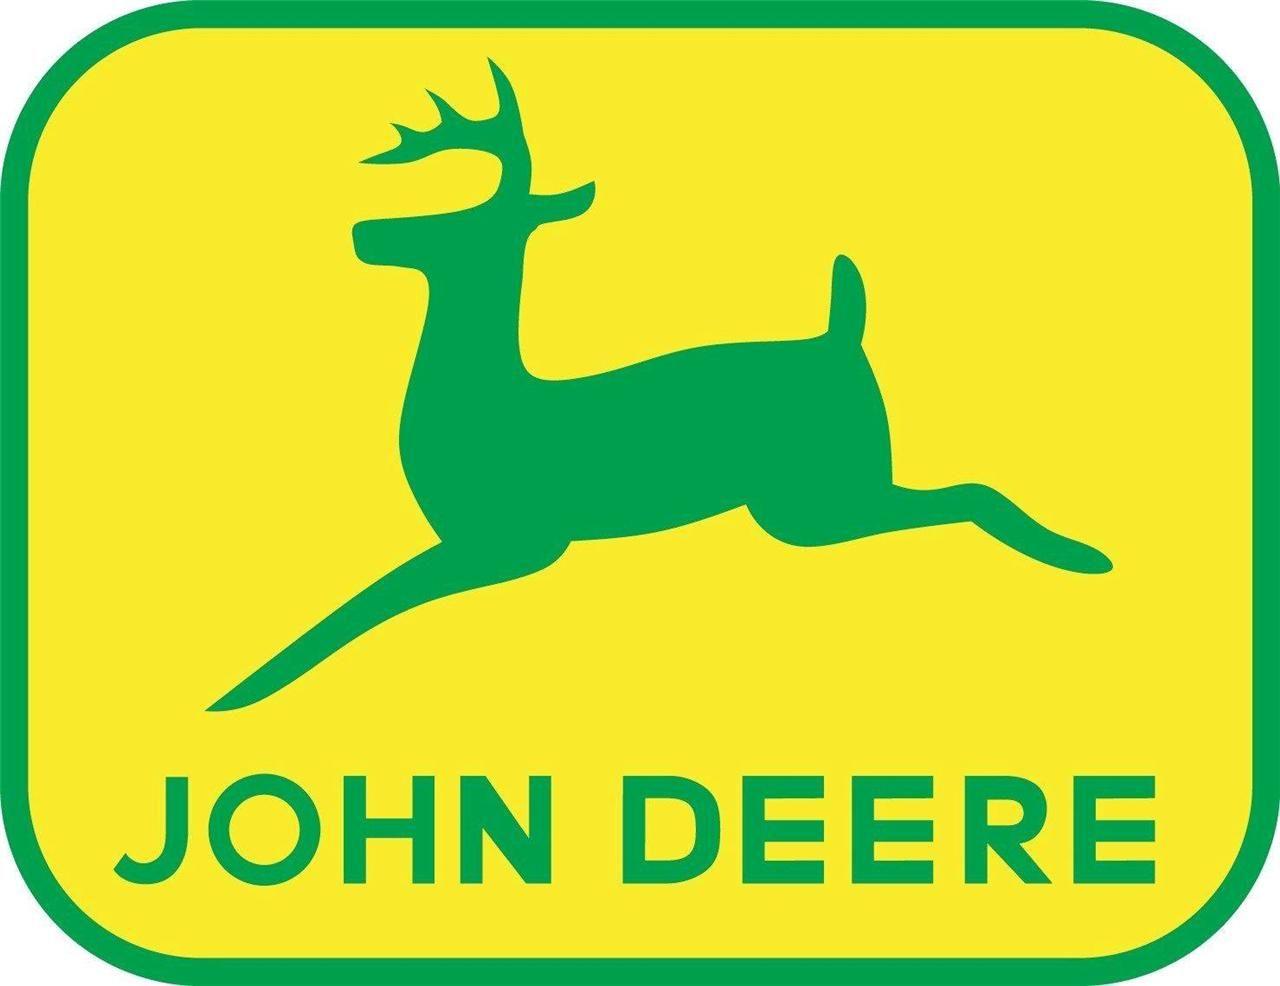 Green JOHN DEERE Stickers